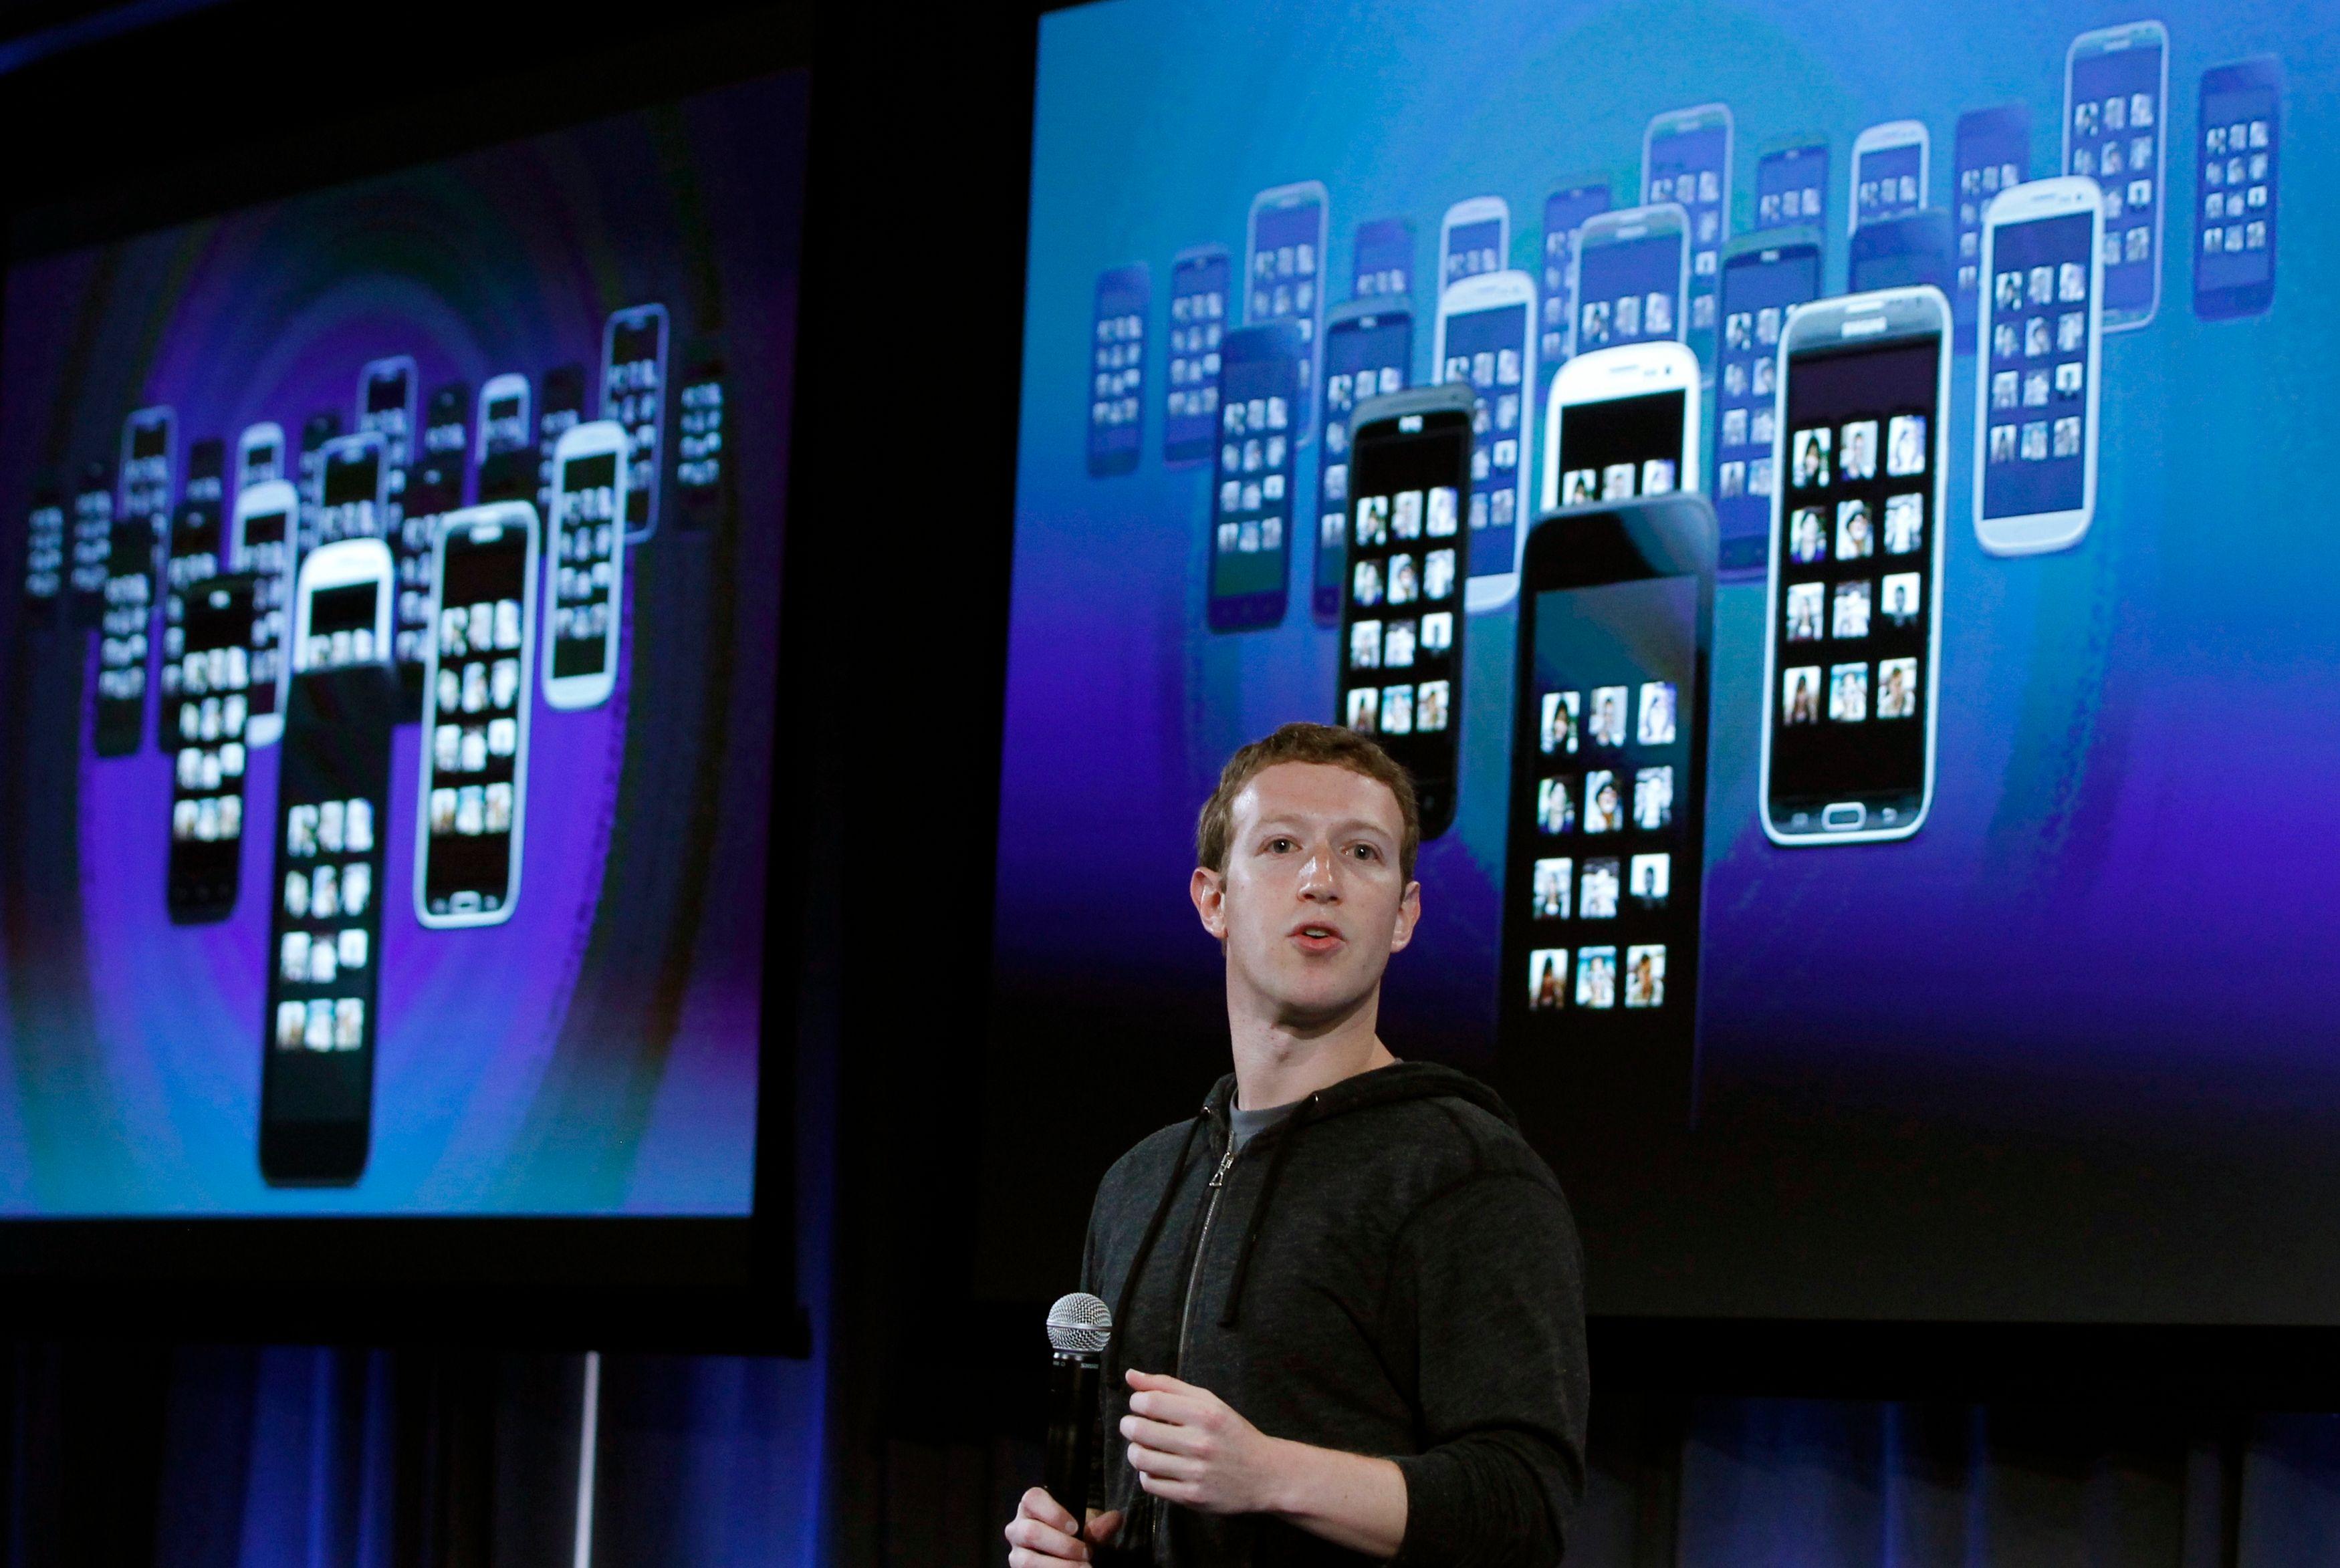 Mark Zuckerberg, fondateur du réseau social Facebook.